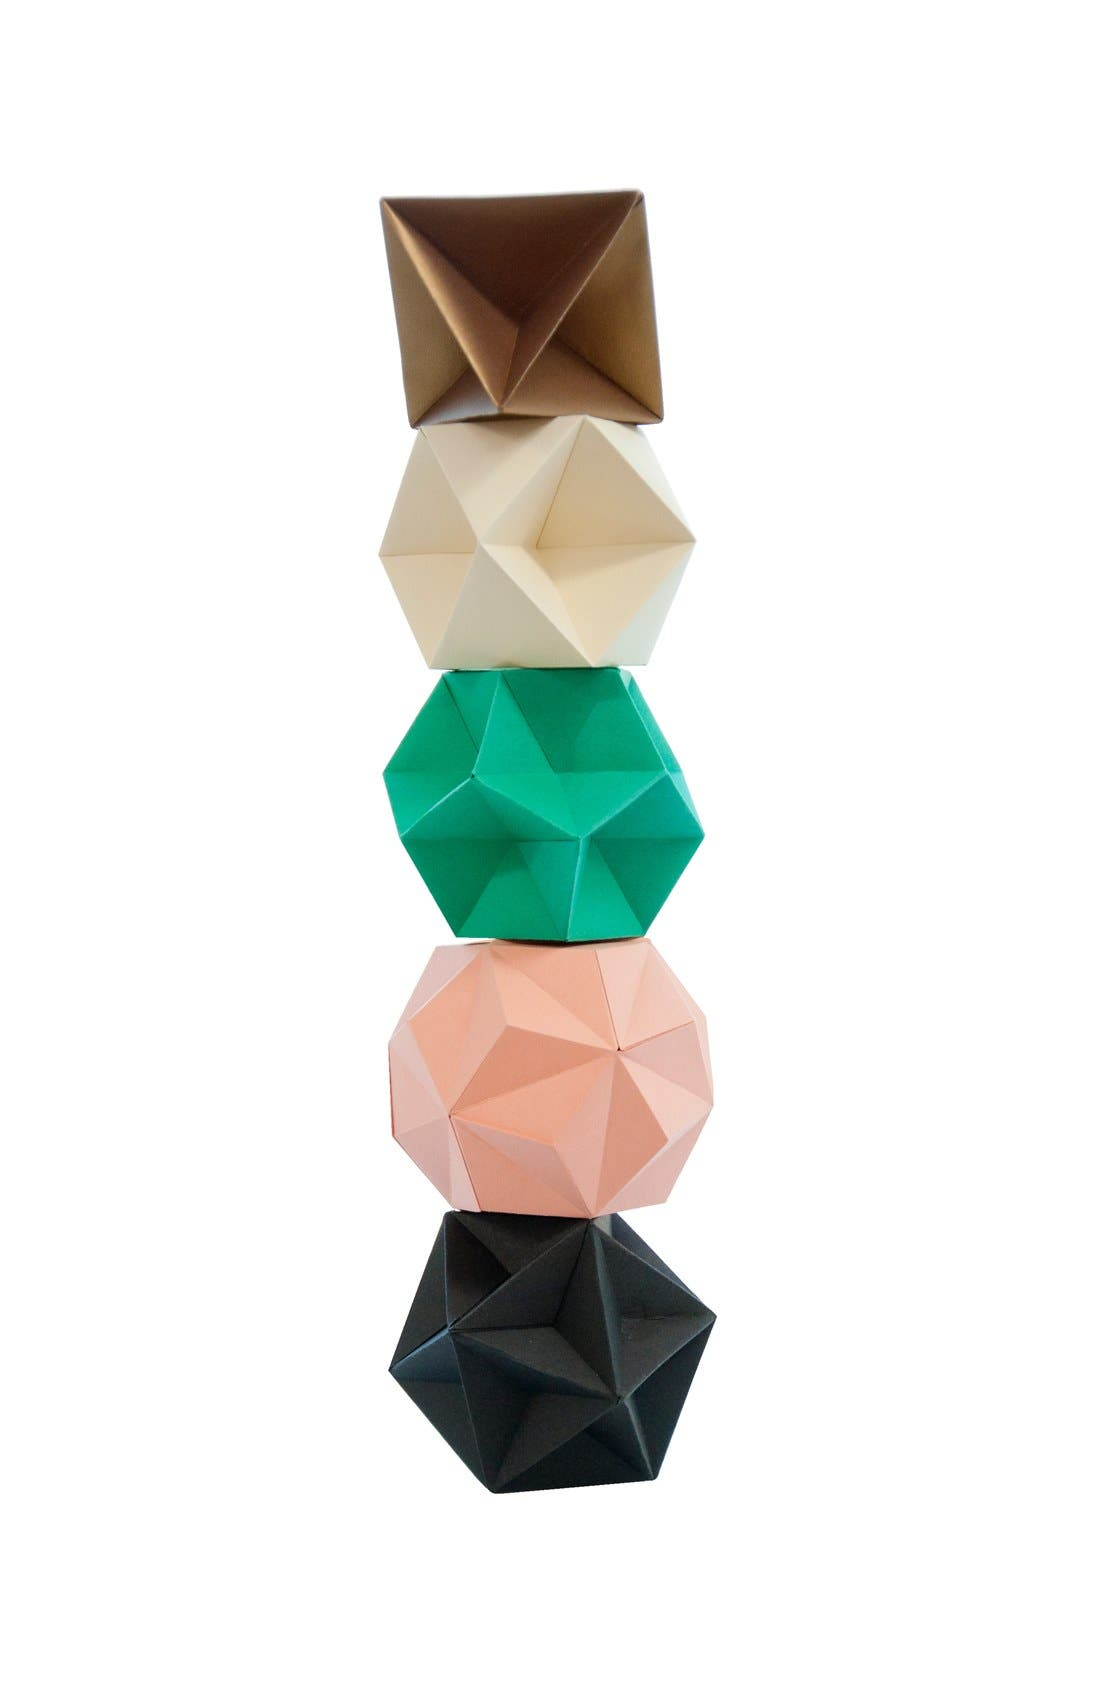 ARTECNICA,                              'Themis Prism' Mobile,                             Alternate thumbnail 2, color,                             101